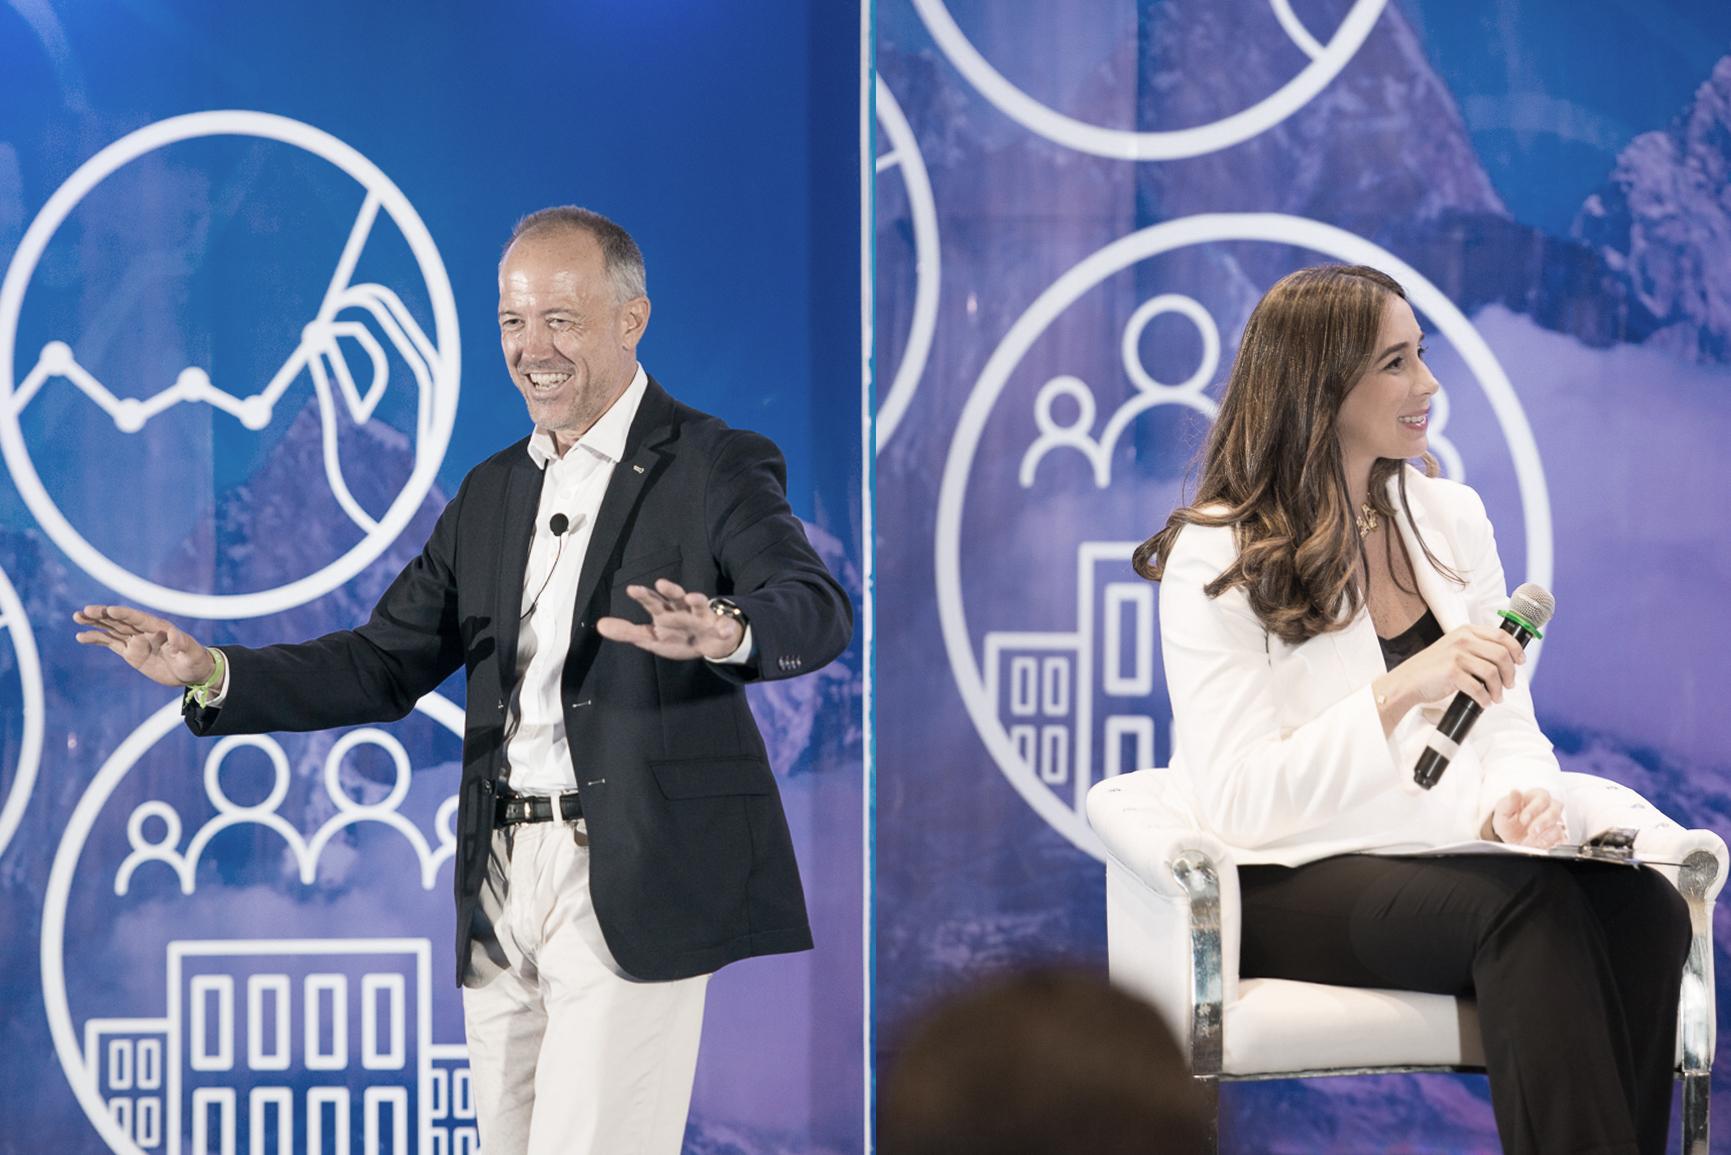 Albert Bosch and Lisa Morel